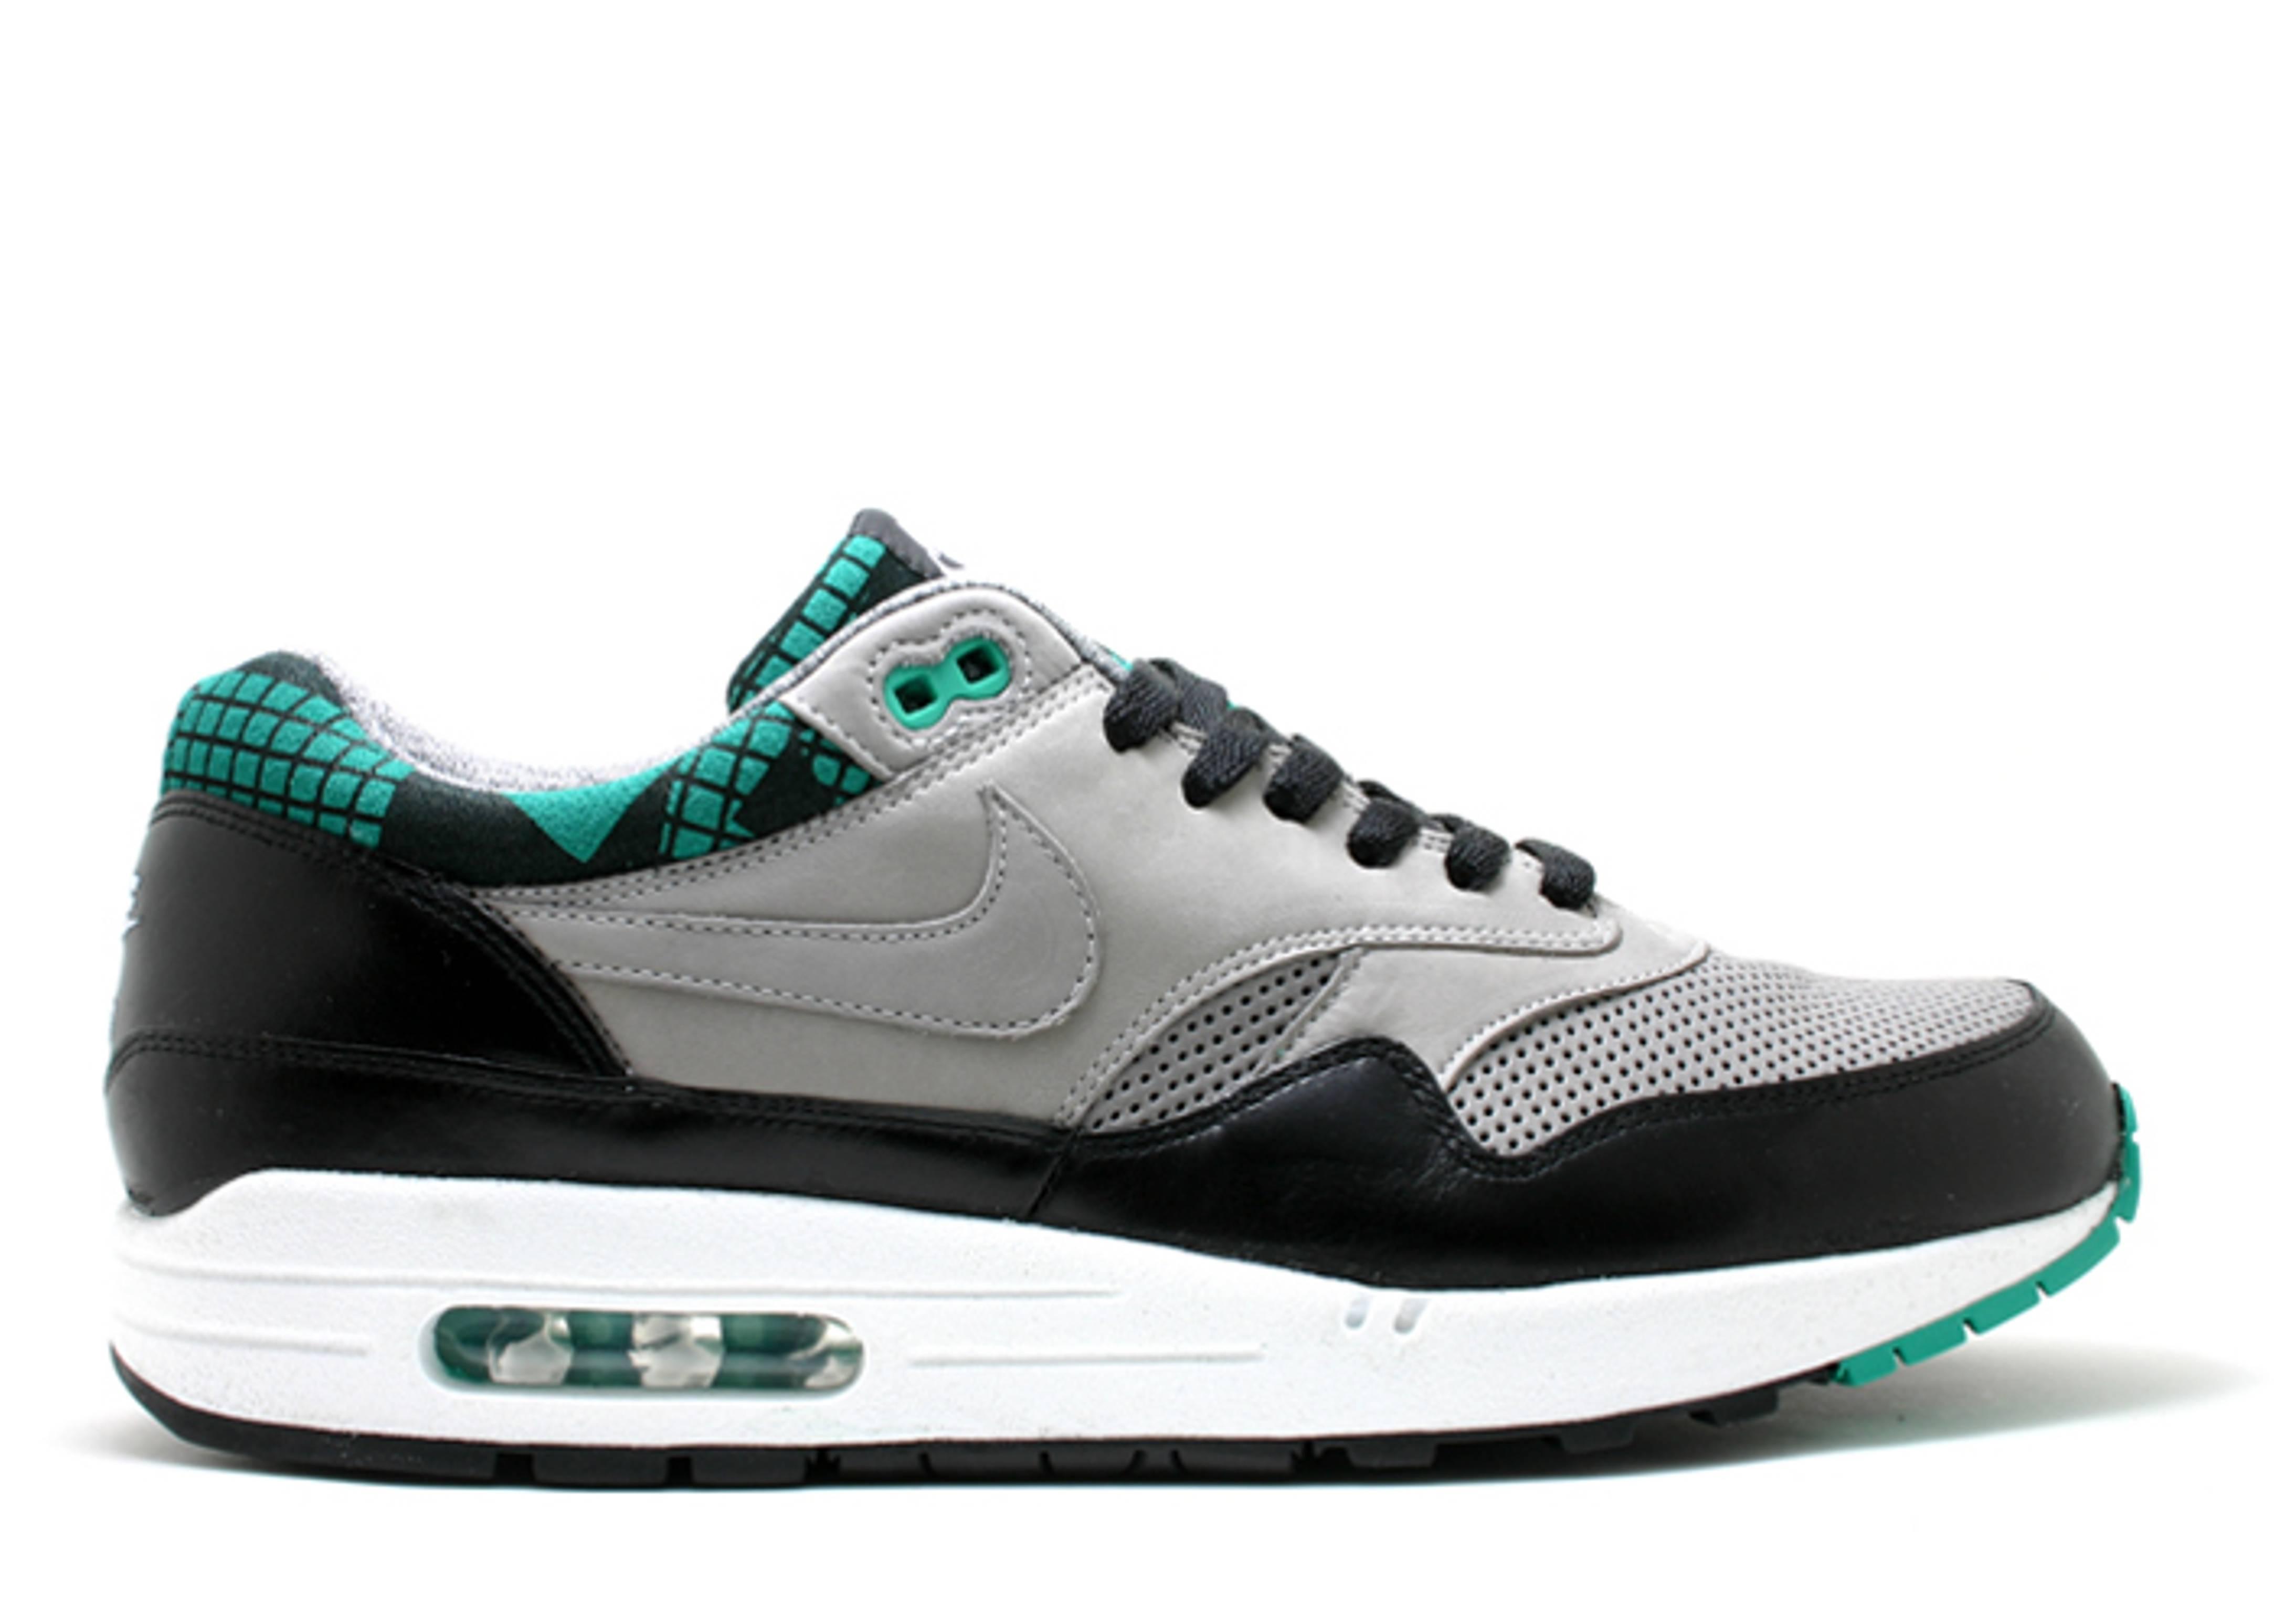 Air Max 1 Premium - Nike - 309717 003 - charcoal heather charcoal  hearther-black-icd  222165bfa